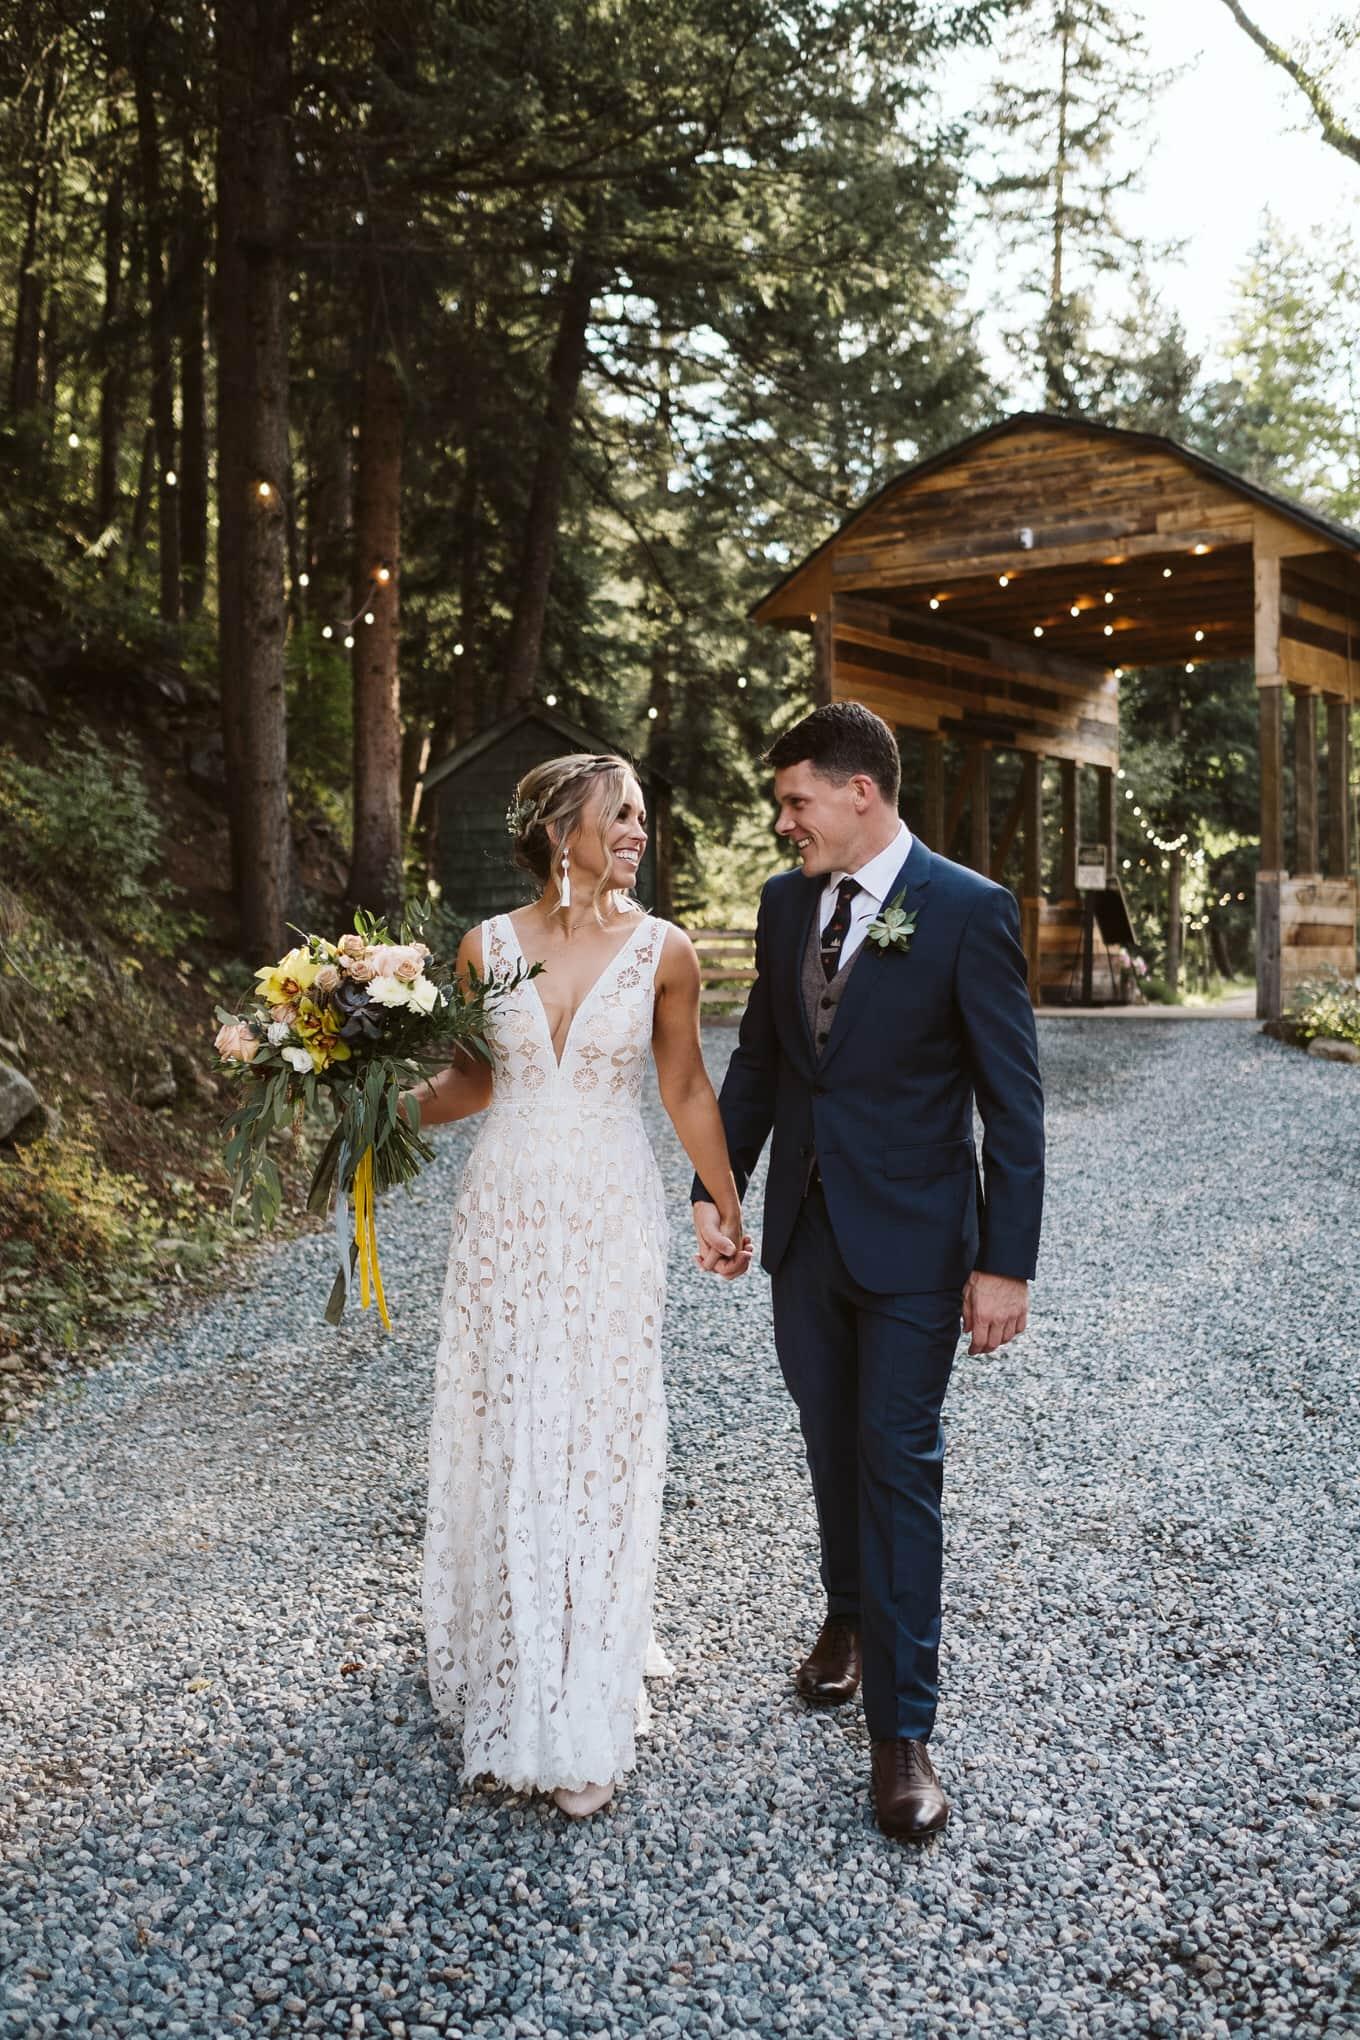 Bride and groom portraits at Blackstone Rivers Ranch wedding venue in Idaho Springs